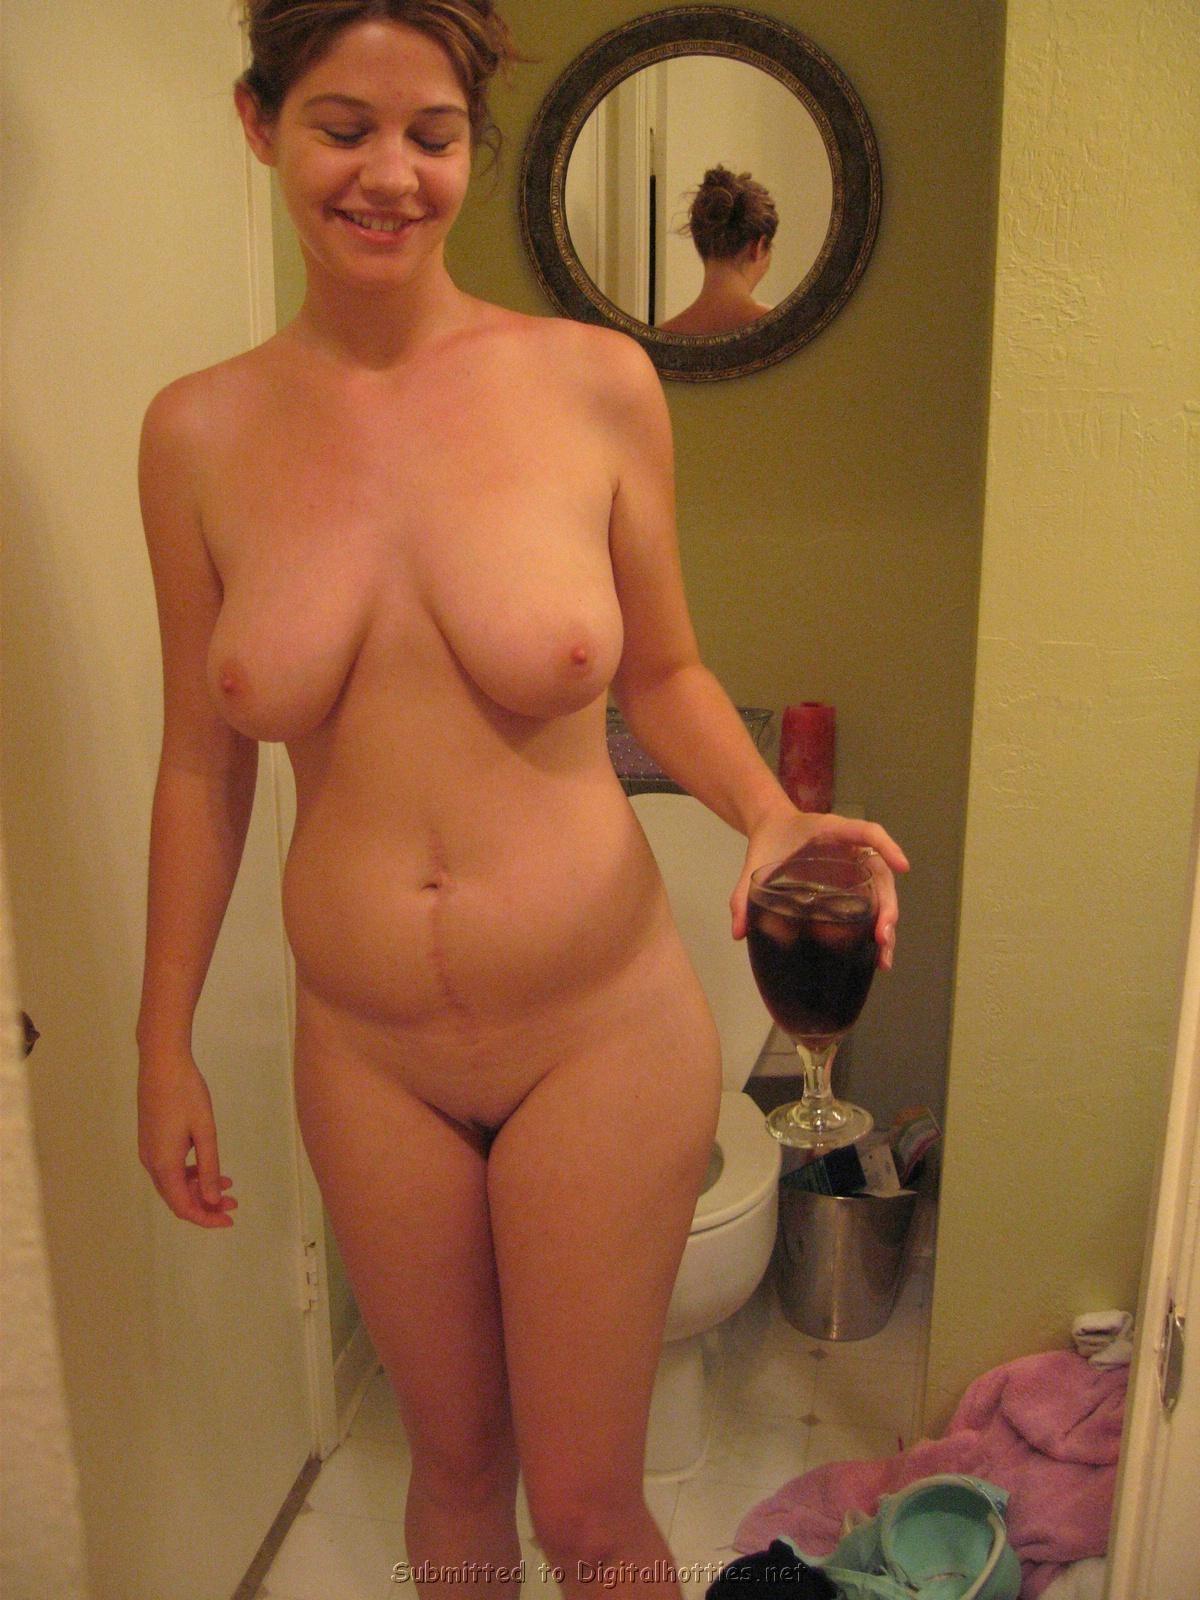 Normal Nude Women 140 Kb Naked Average Girls Nude Resolution